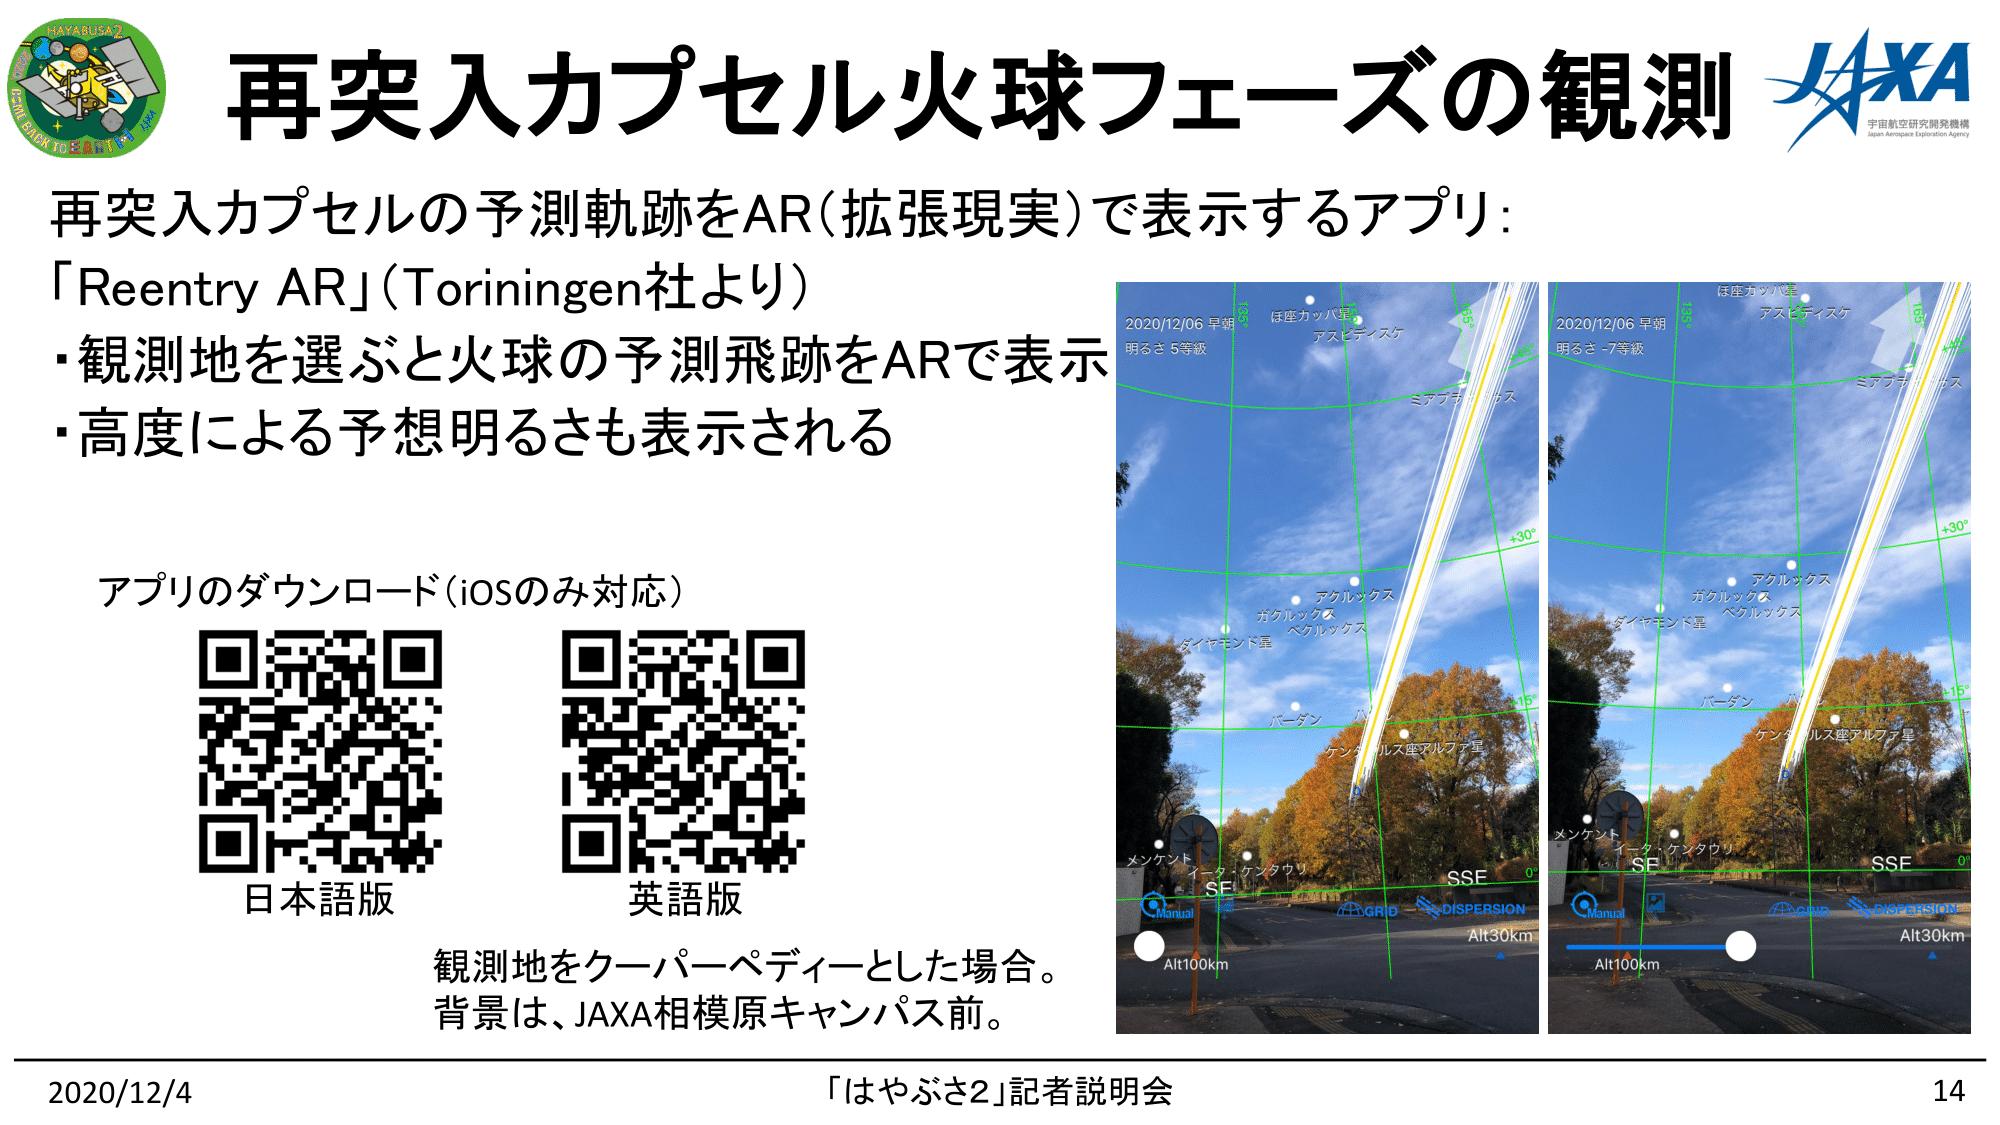 f:id:Imamura:20201204153855p:plain